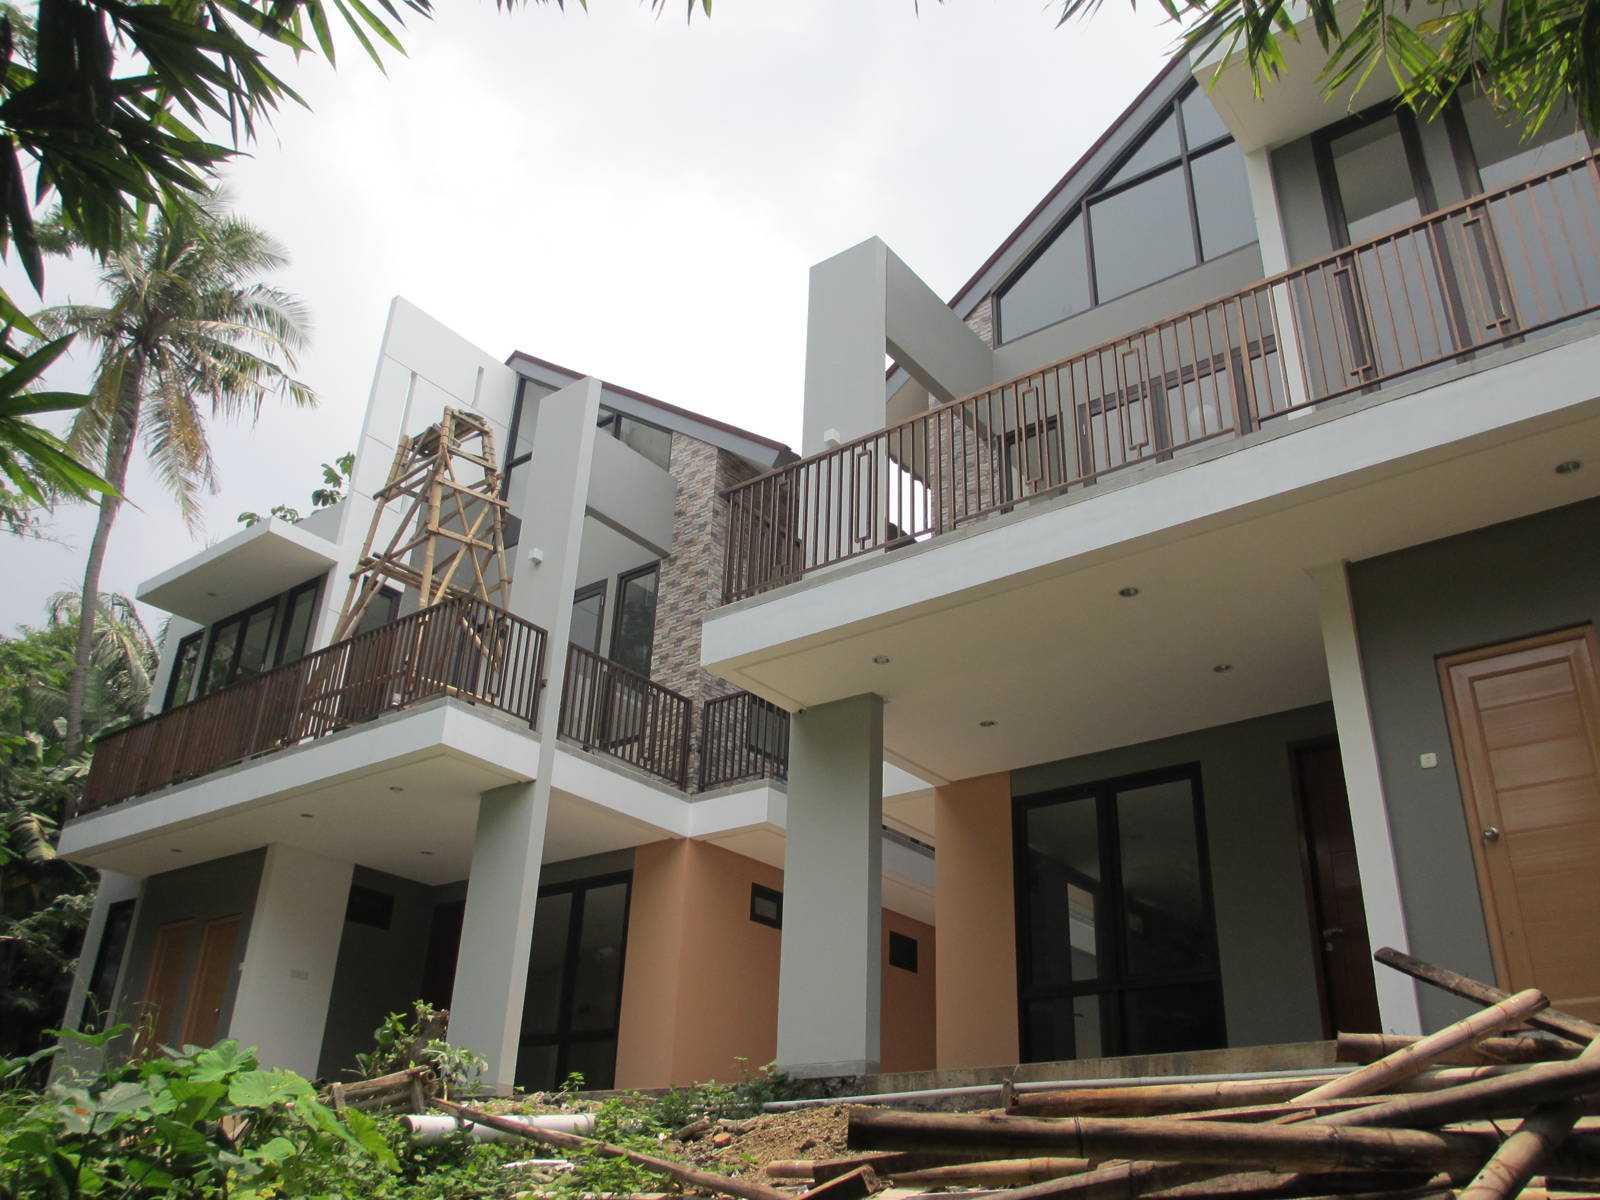 Pda Arsitek Rumah Kamboja Depok, Kota Depok, Jawa Barat, Indonesia Depok, Kota Depok, Jawa Barat, Indonesia Facade Modern  39631